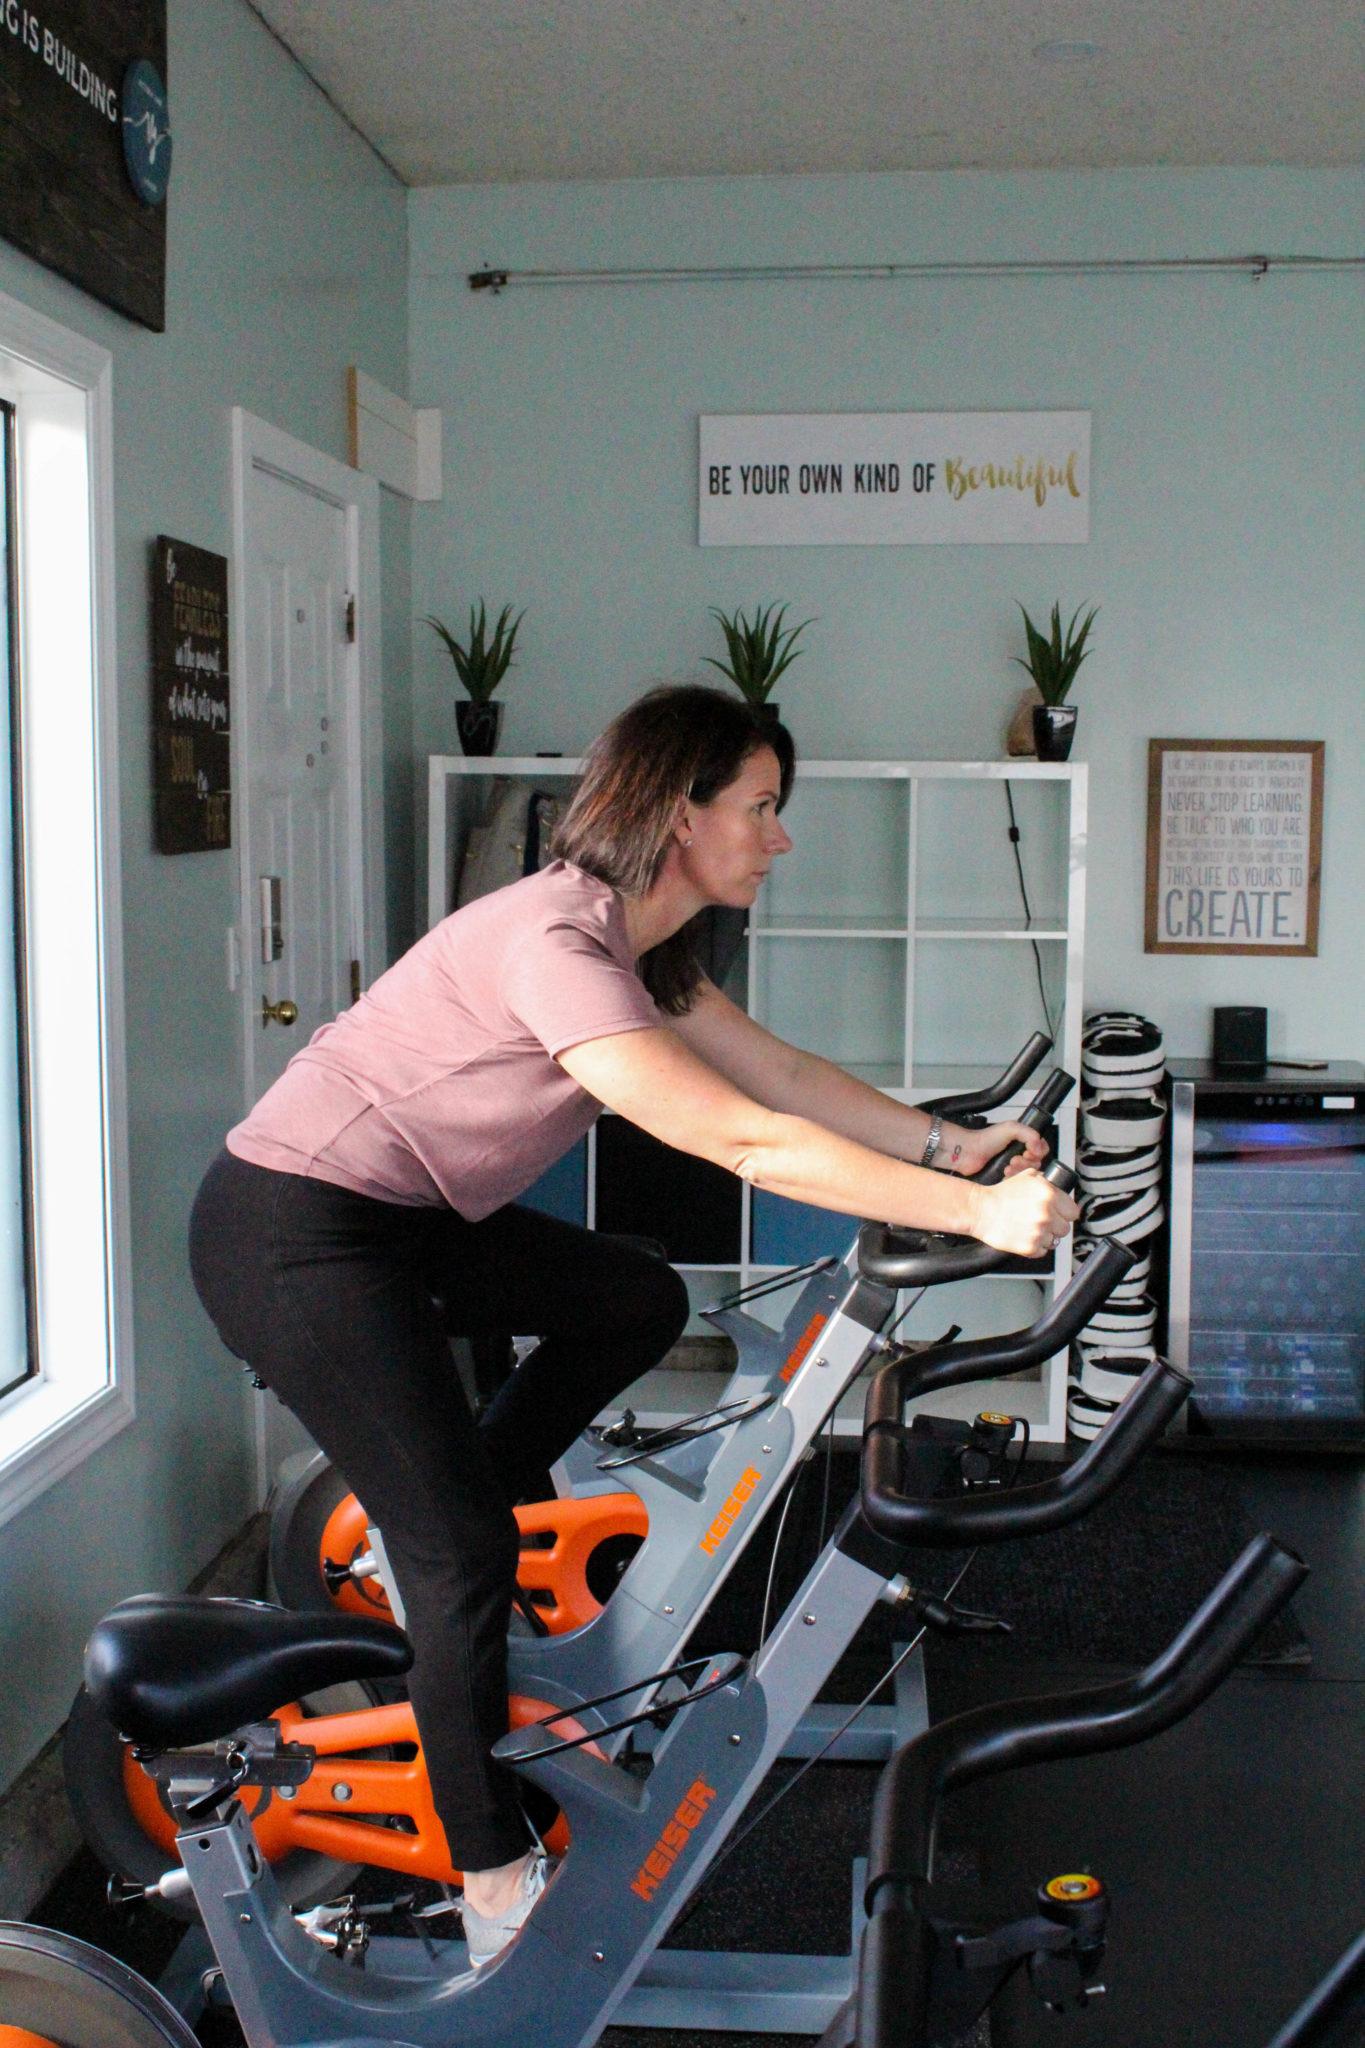 abbotsford gym victoria jane fitness